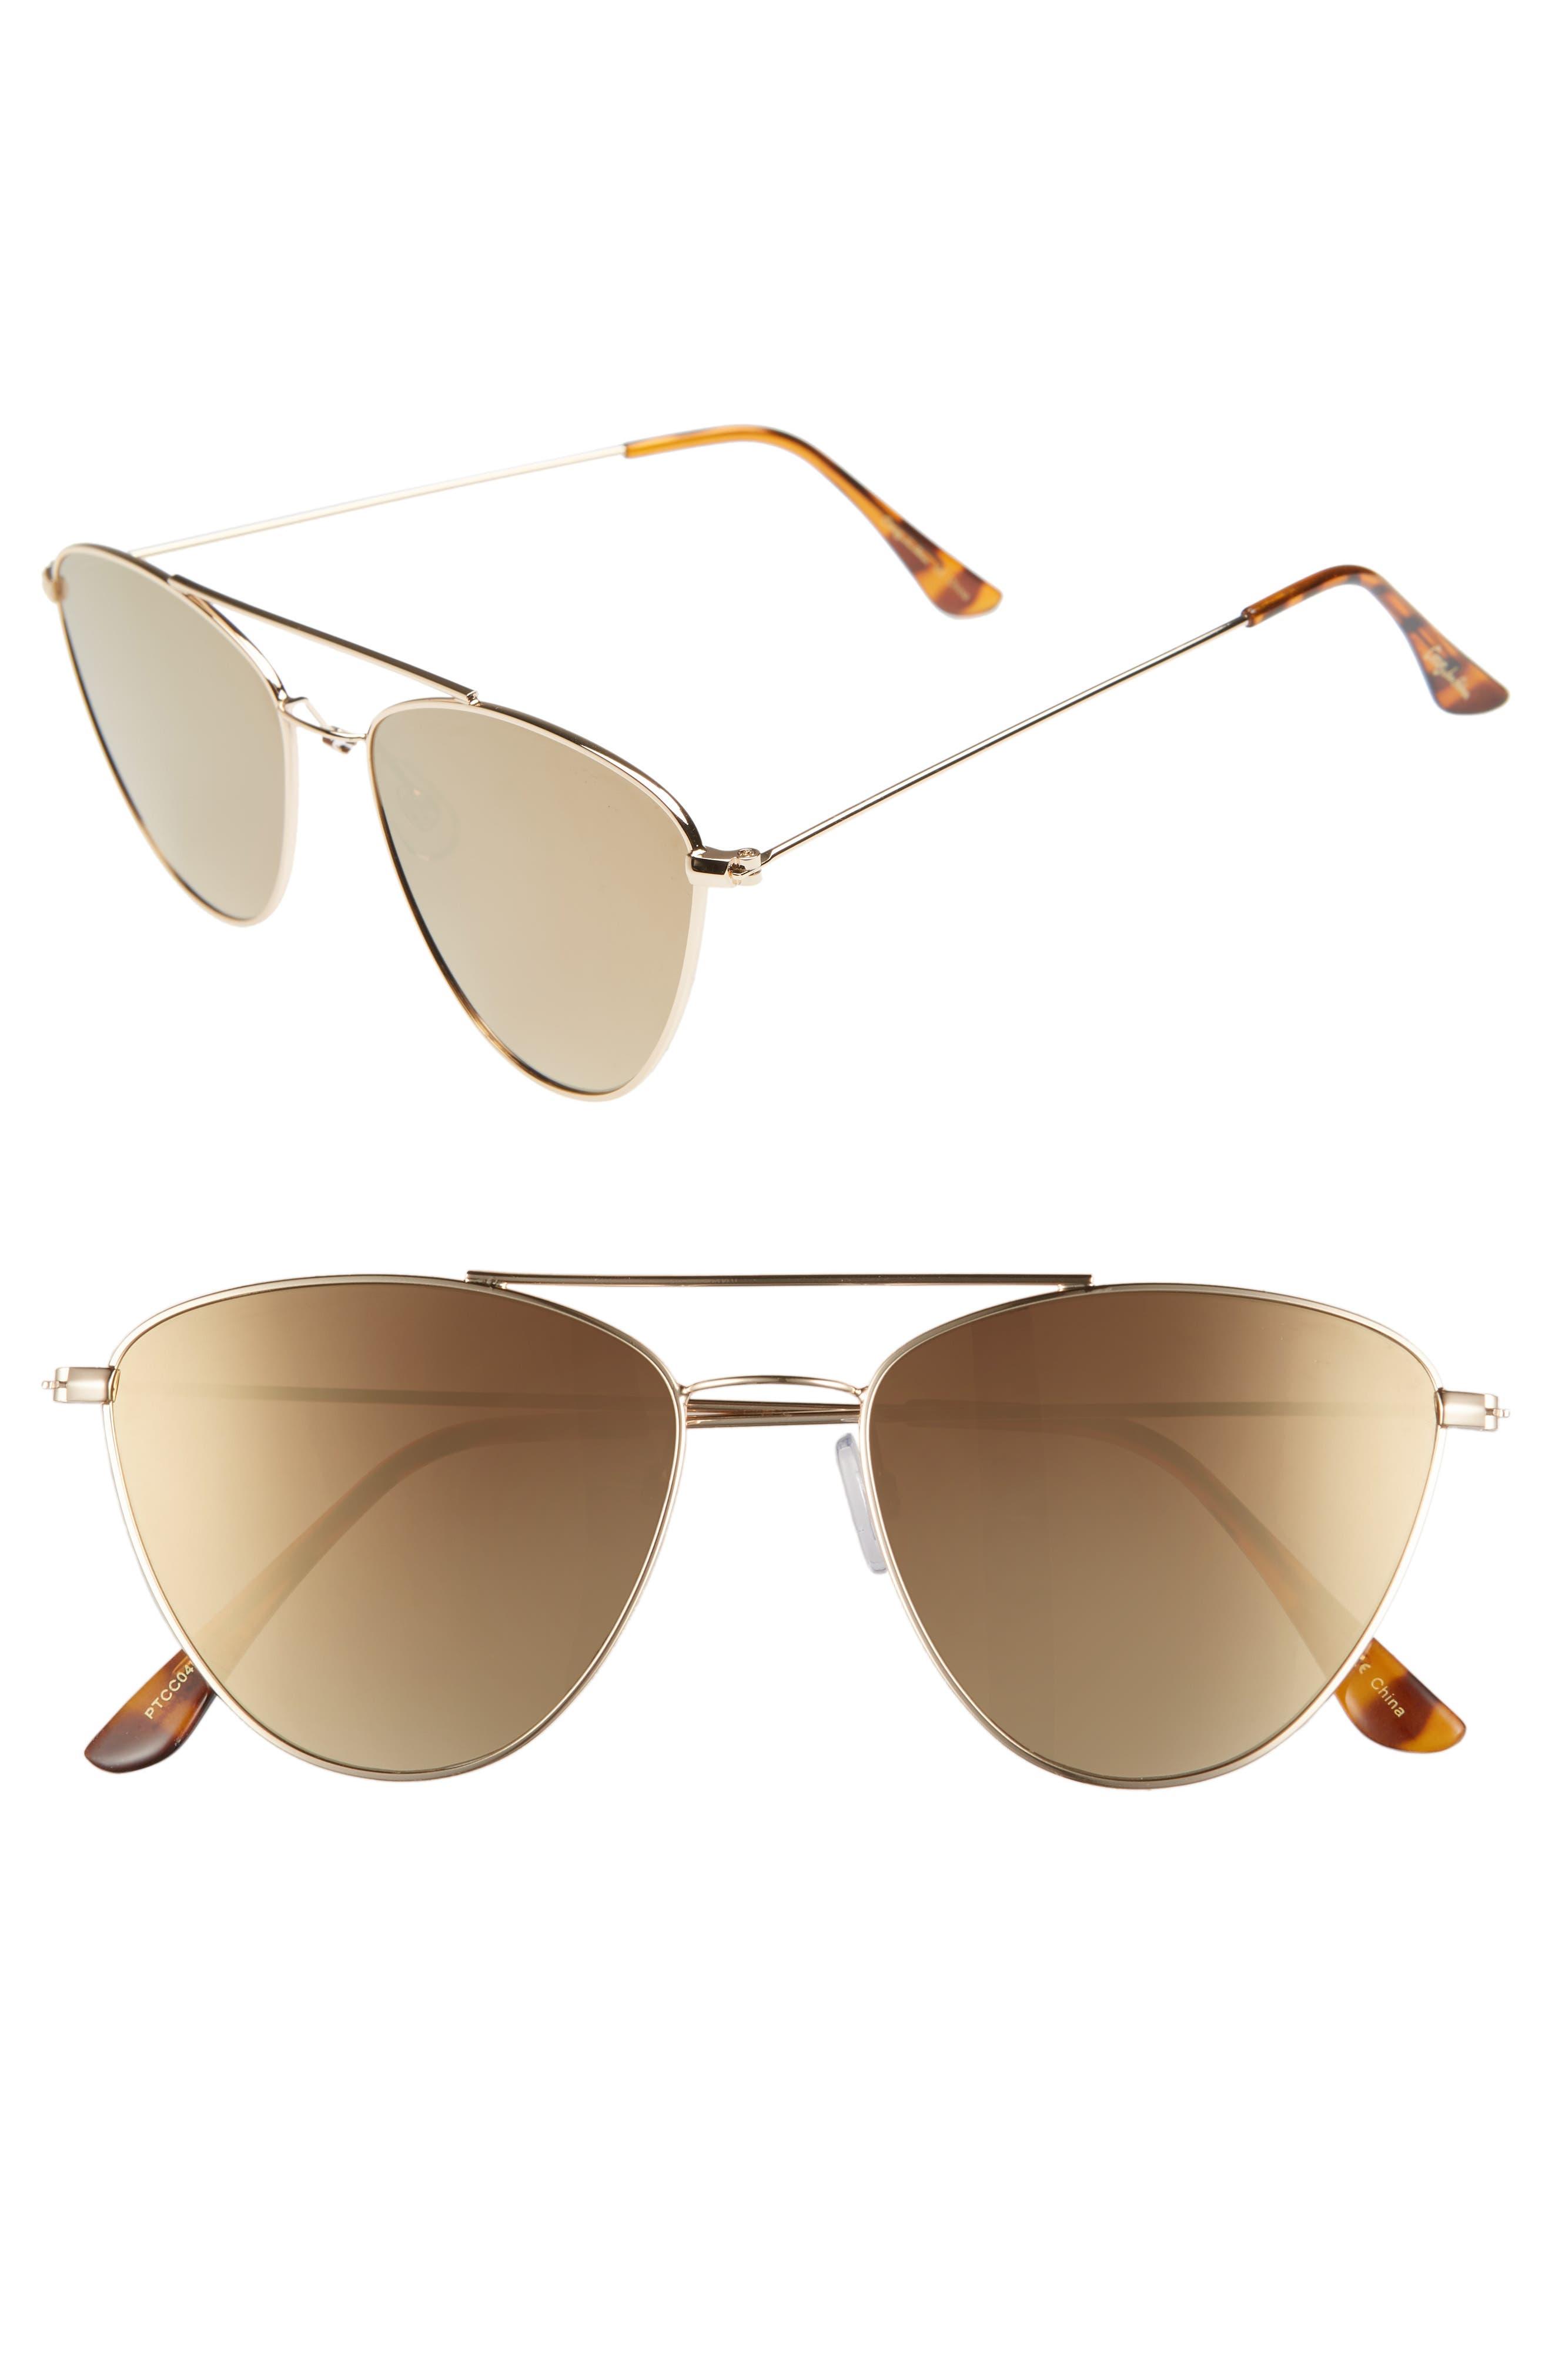 CIRCUS BY SAM EDELMAN 57Mm Mirrored Cat Eye Sunglasses - Gold